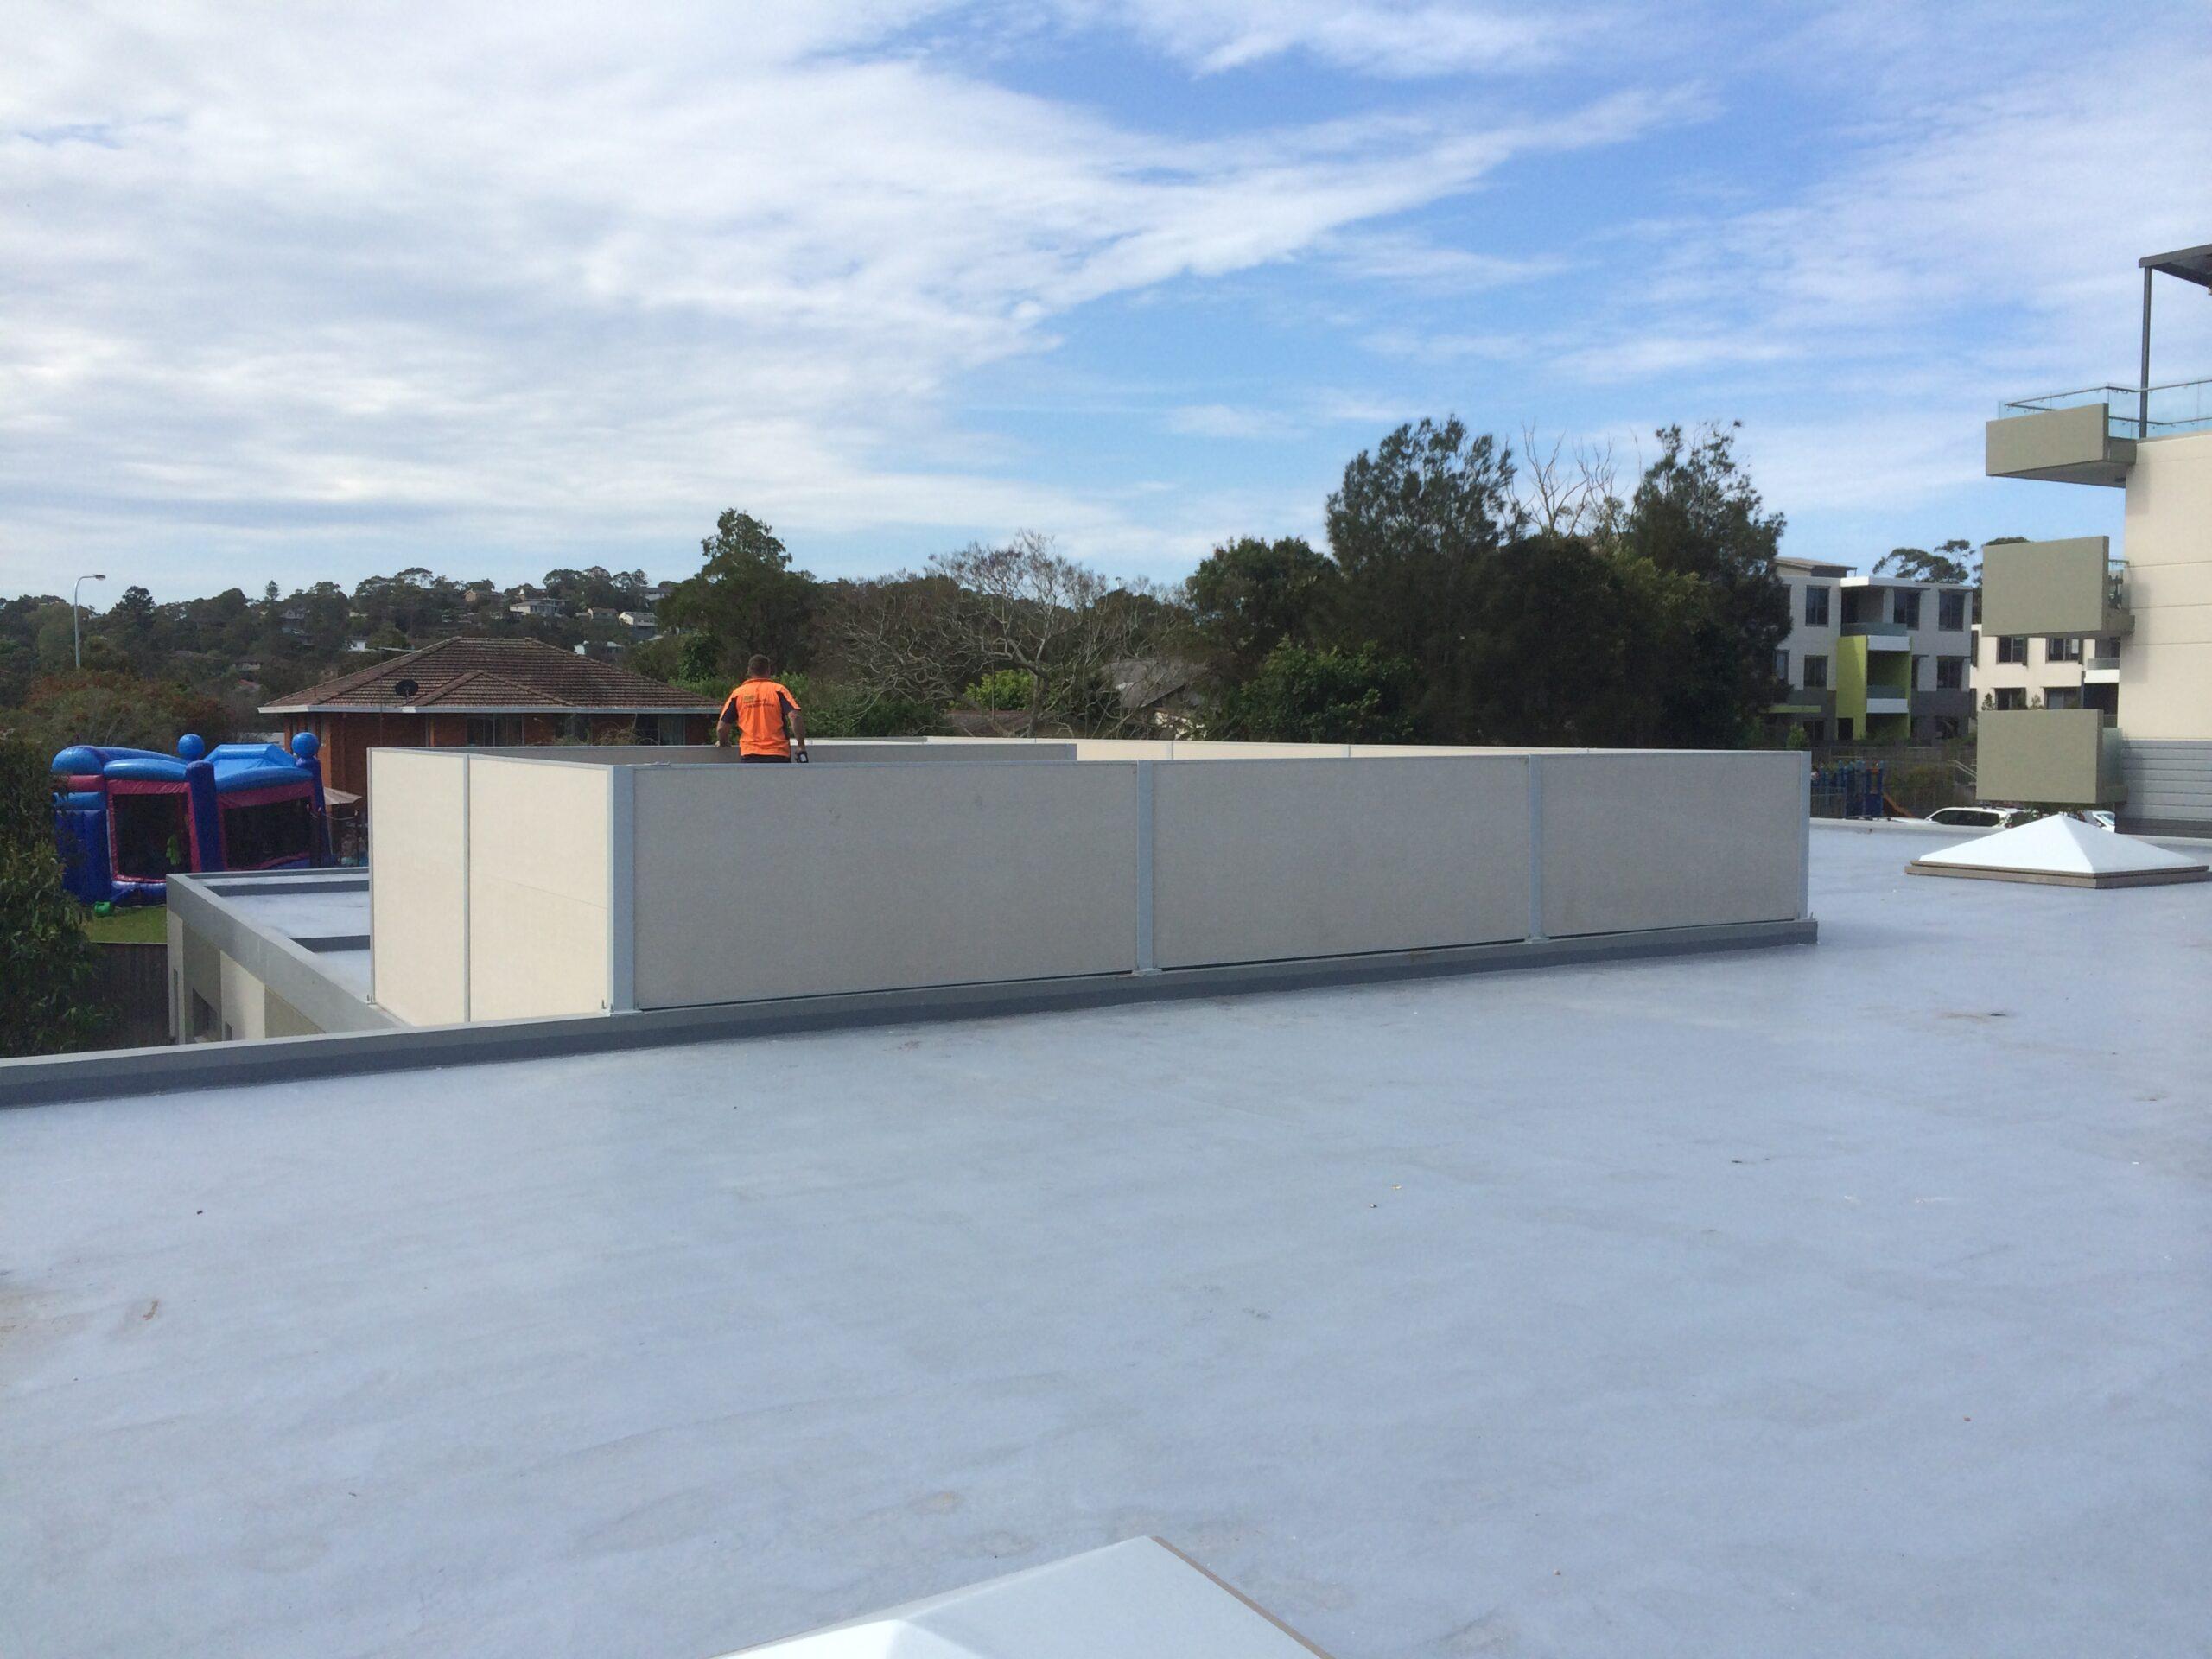 Evowall with Acoustx Panel by Wallmark Australia 1.8m high at Sydney NSW